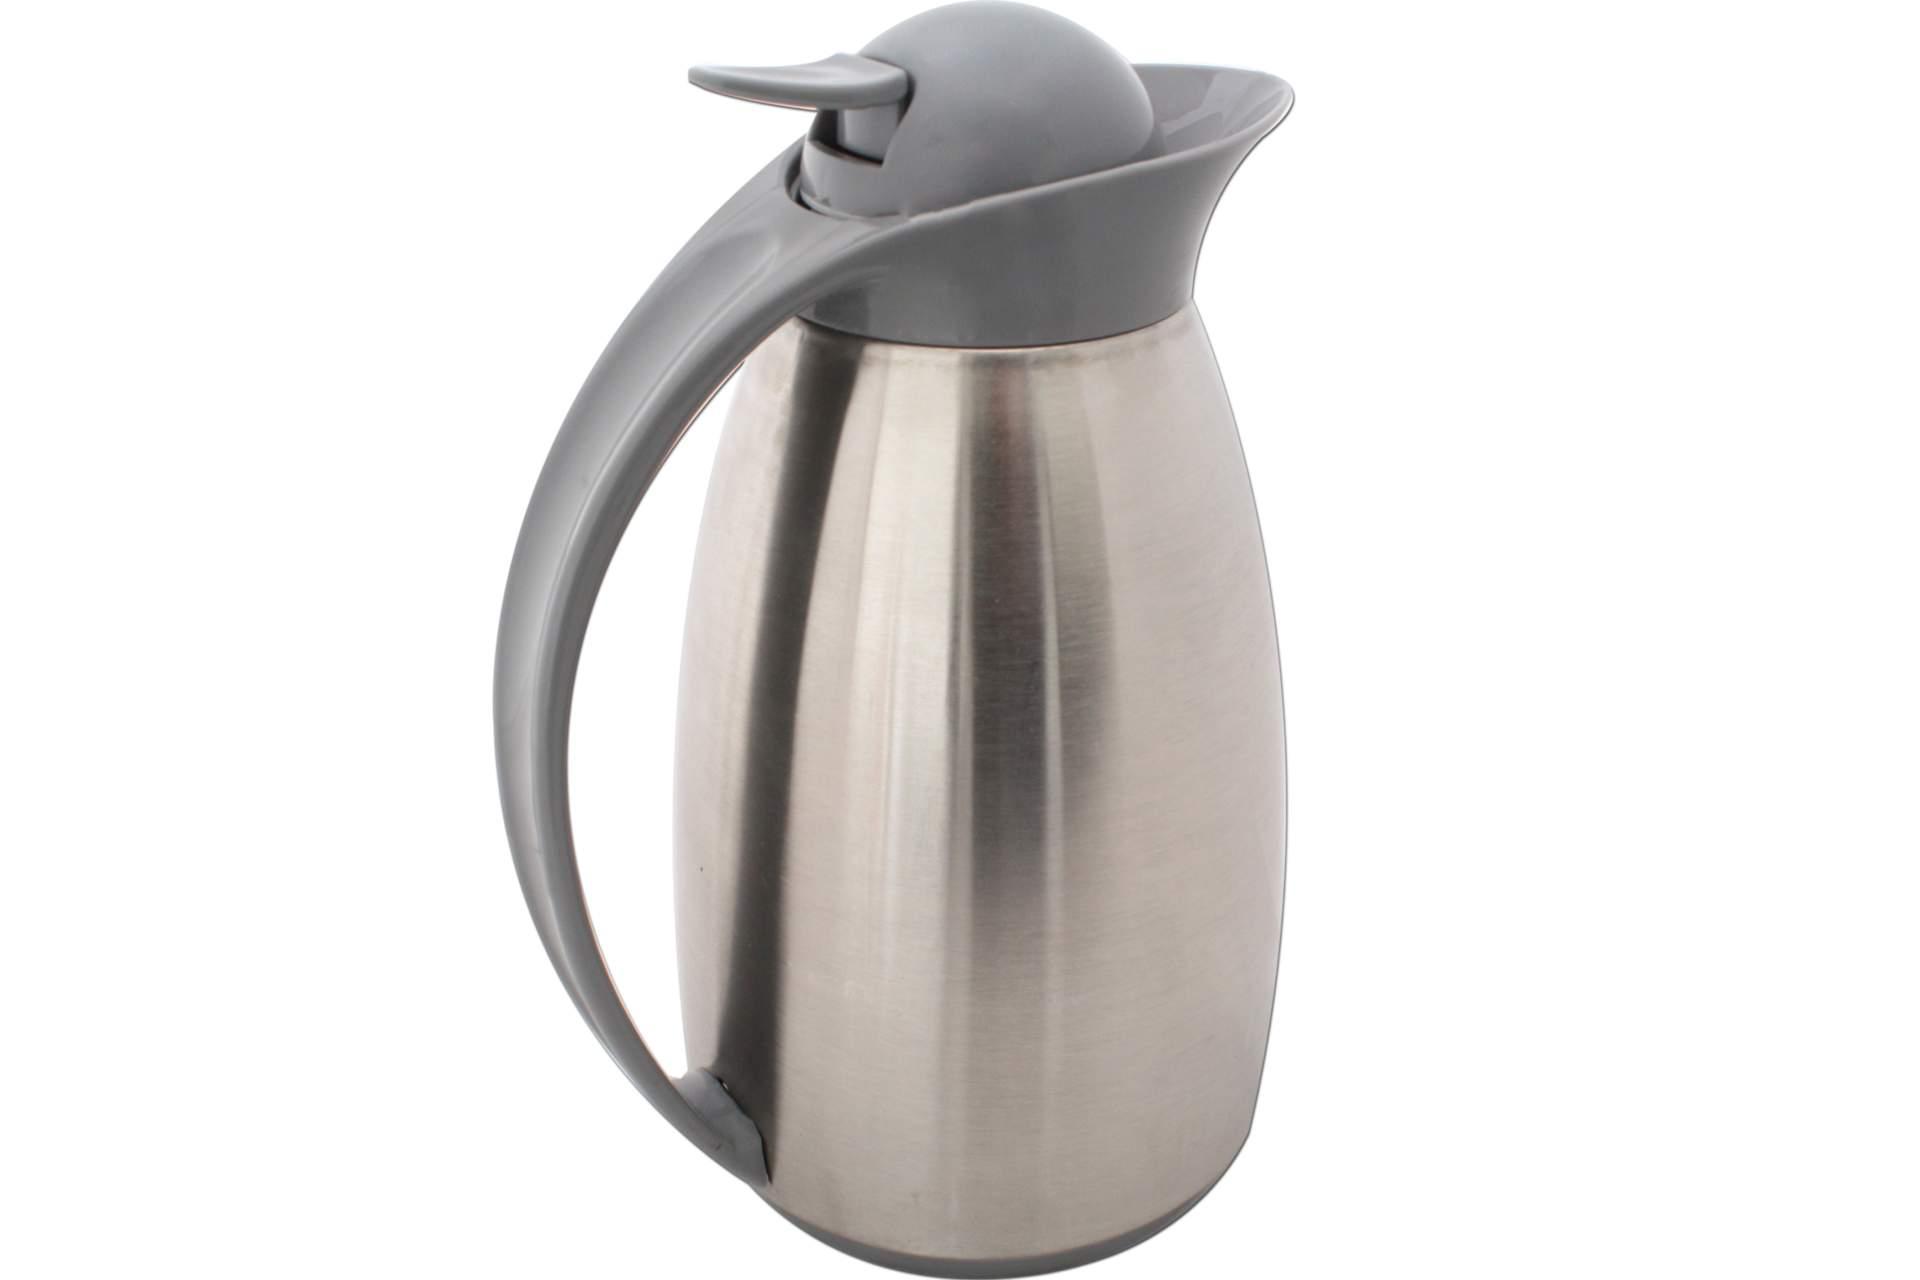 thermo kaffee kanne thermoskanne thermokanne warmhaltekanne 1 liter grau silber ebay. Black Bedroom Furniture Sets. Home Design Ideas